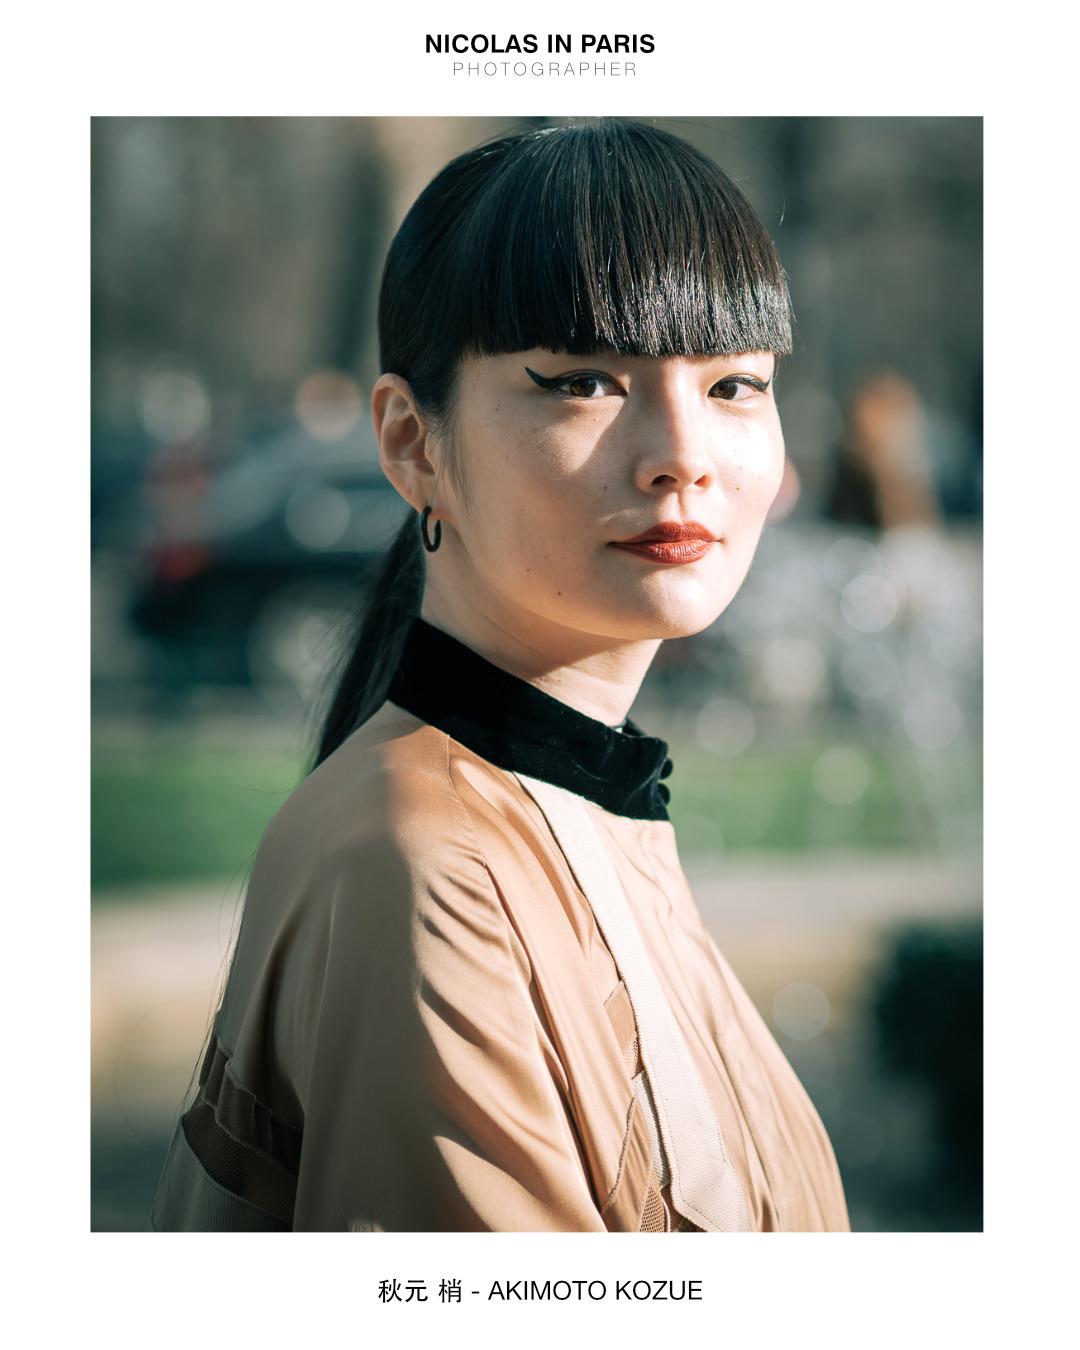 Japanese Model Akimoto Kozue attending Sacai show during Paris Fashion Week, January 2020 | 📸 by @nicolasinparis _Contact (please DM or Email)✉️Email: nicolasinparis1@gmail.com #street fashion#paris#france#pfw #paris fashion week #fashion week#akimoto kozue#akimotokozue#haute couture#sacai#お洒落#秋元梢#おしゃれ好き#fashionstyling#fashiondiary#modelportrait#globeportraits#celebritystyles#styledby#igfashionlovers